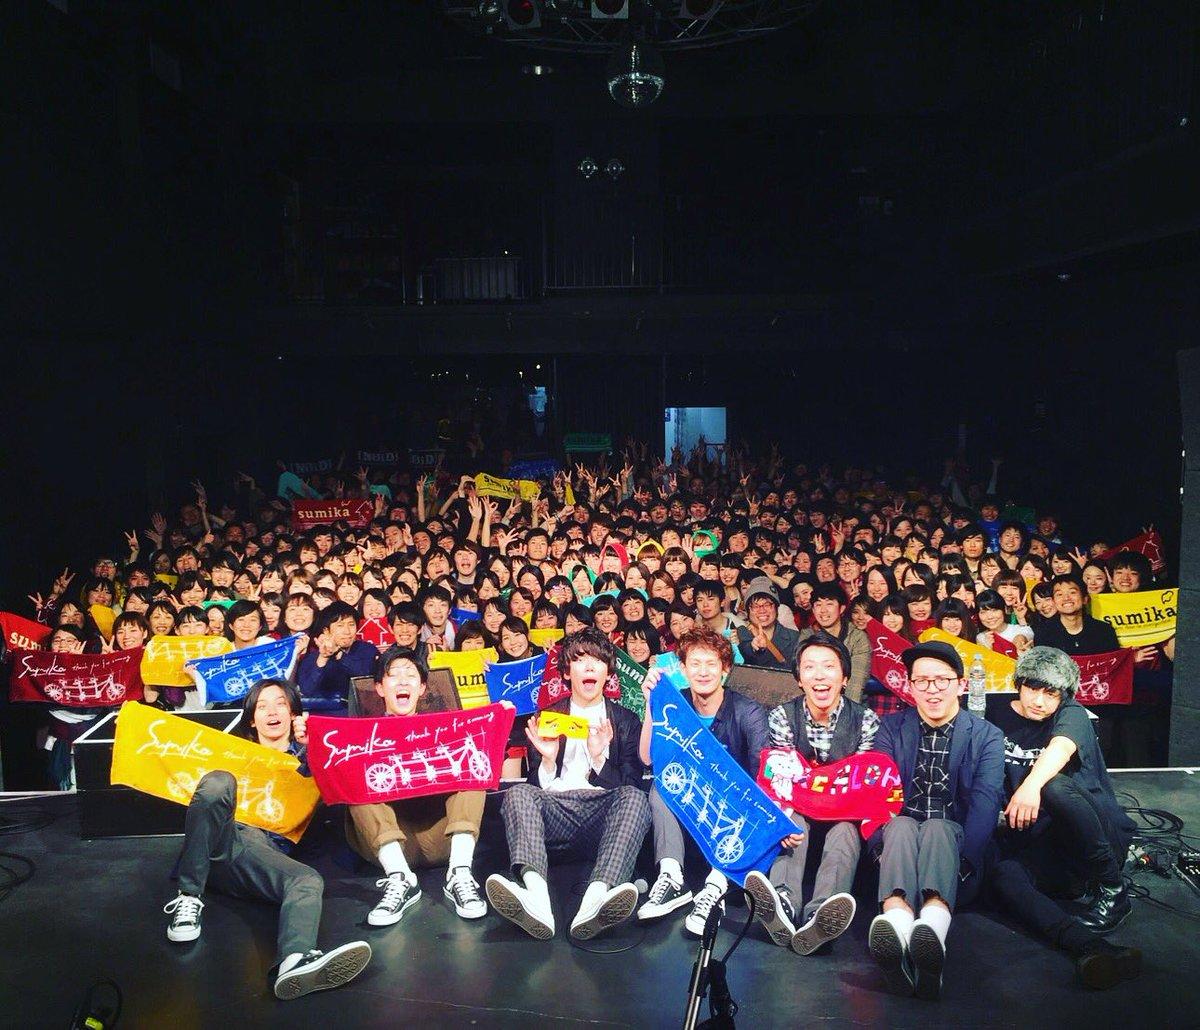 【福岡公演終了】 『SALLY e.p』Release Oneman Live Tour @ 福岡B…